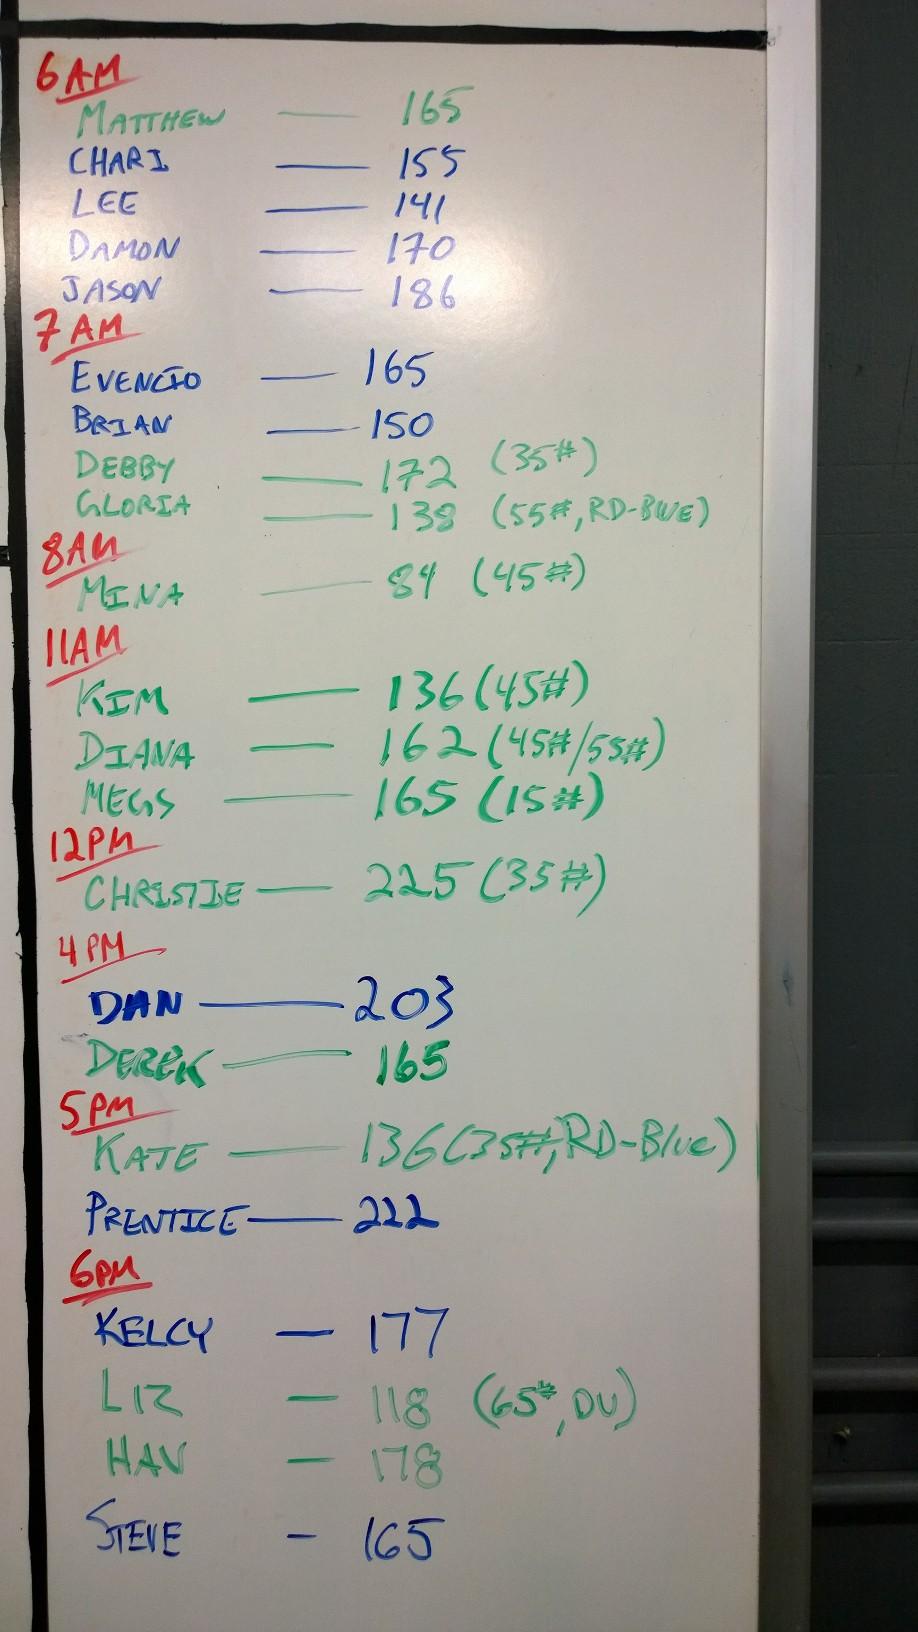 Apr 25 WOD Results